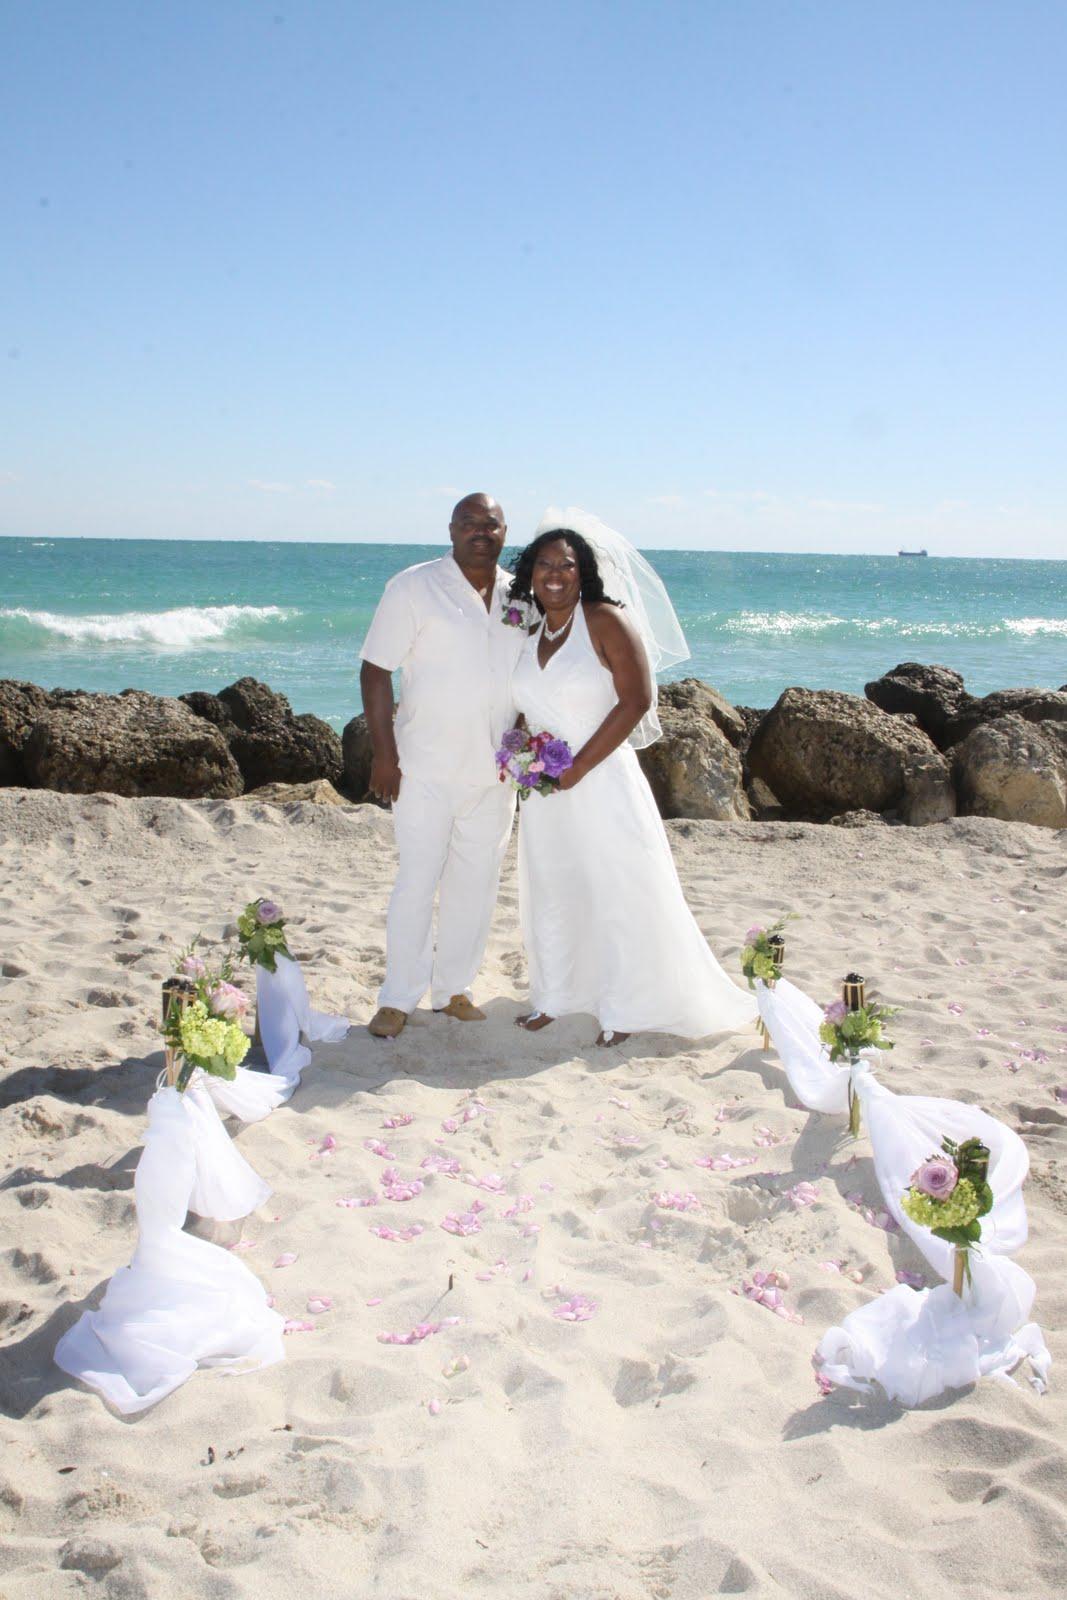 affordable beach weddings 305 793 4387 tonya richie